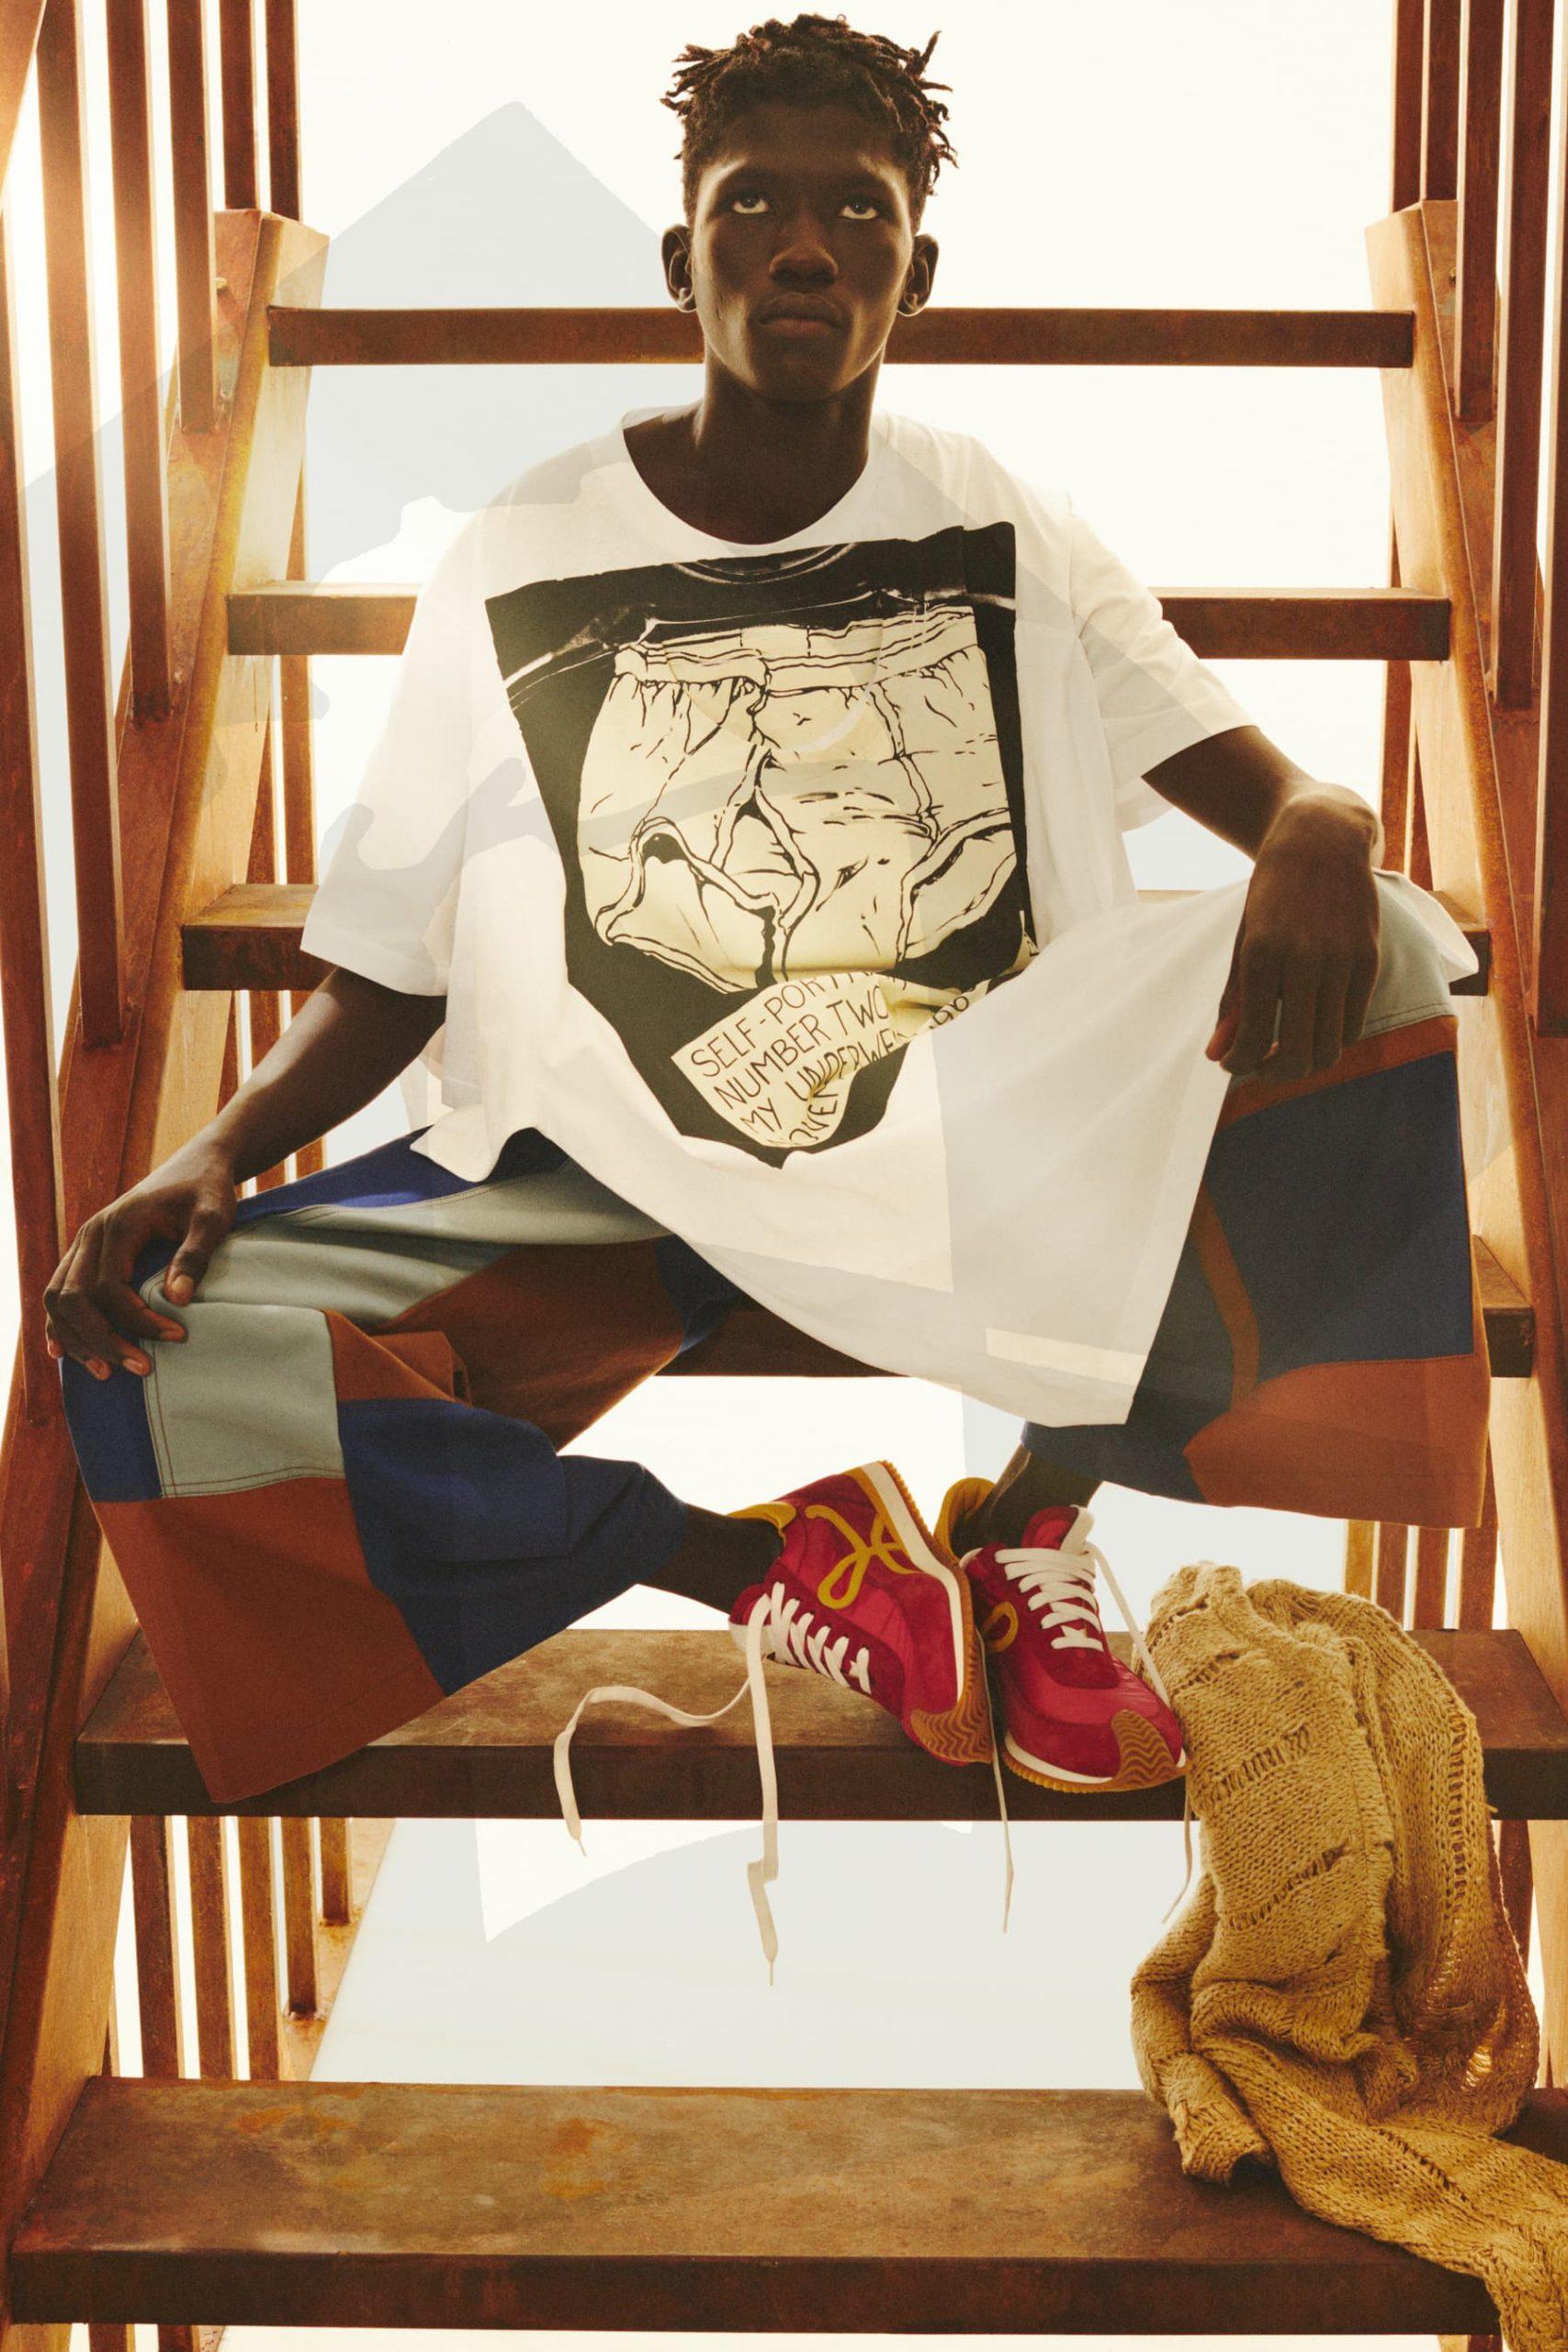 Review of Wales Bonner, Loewe, & Casablanca Paris Fall 2021 Men's Fashion Shows